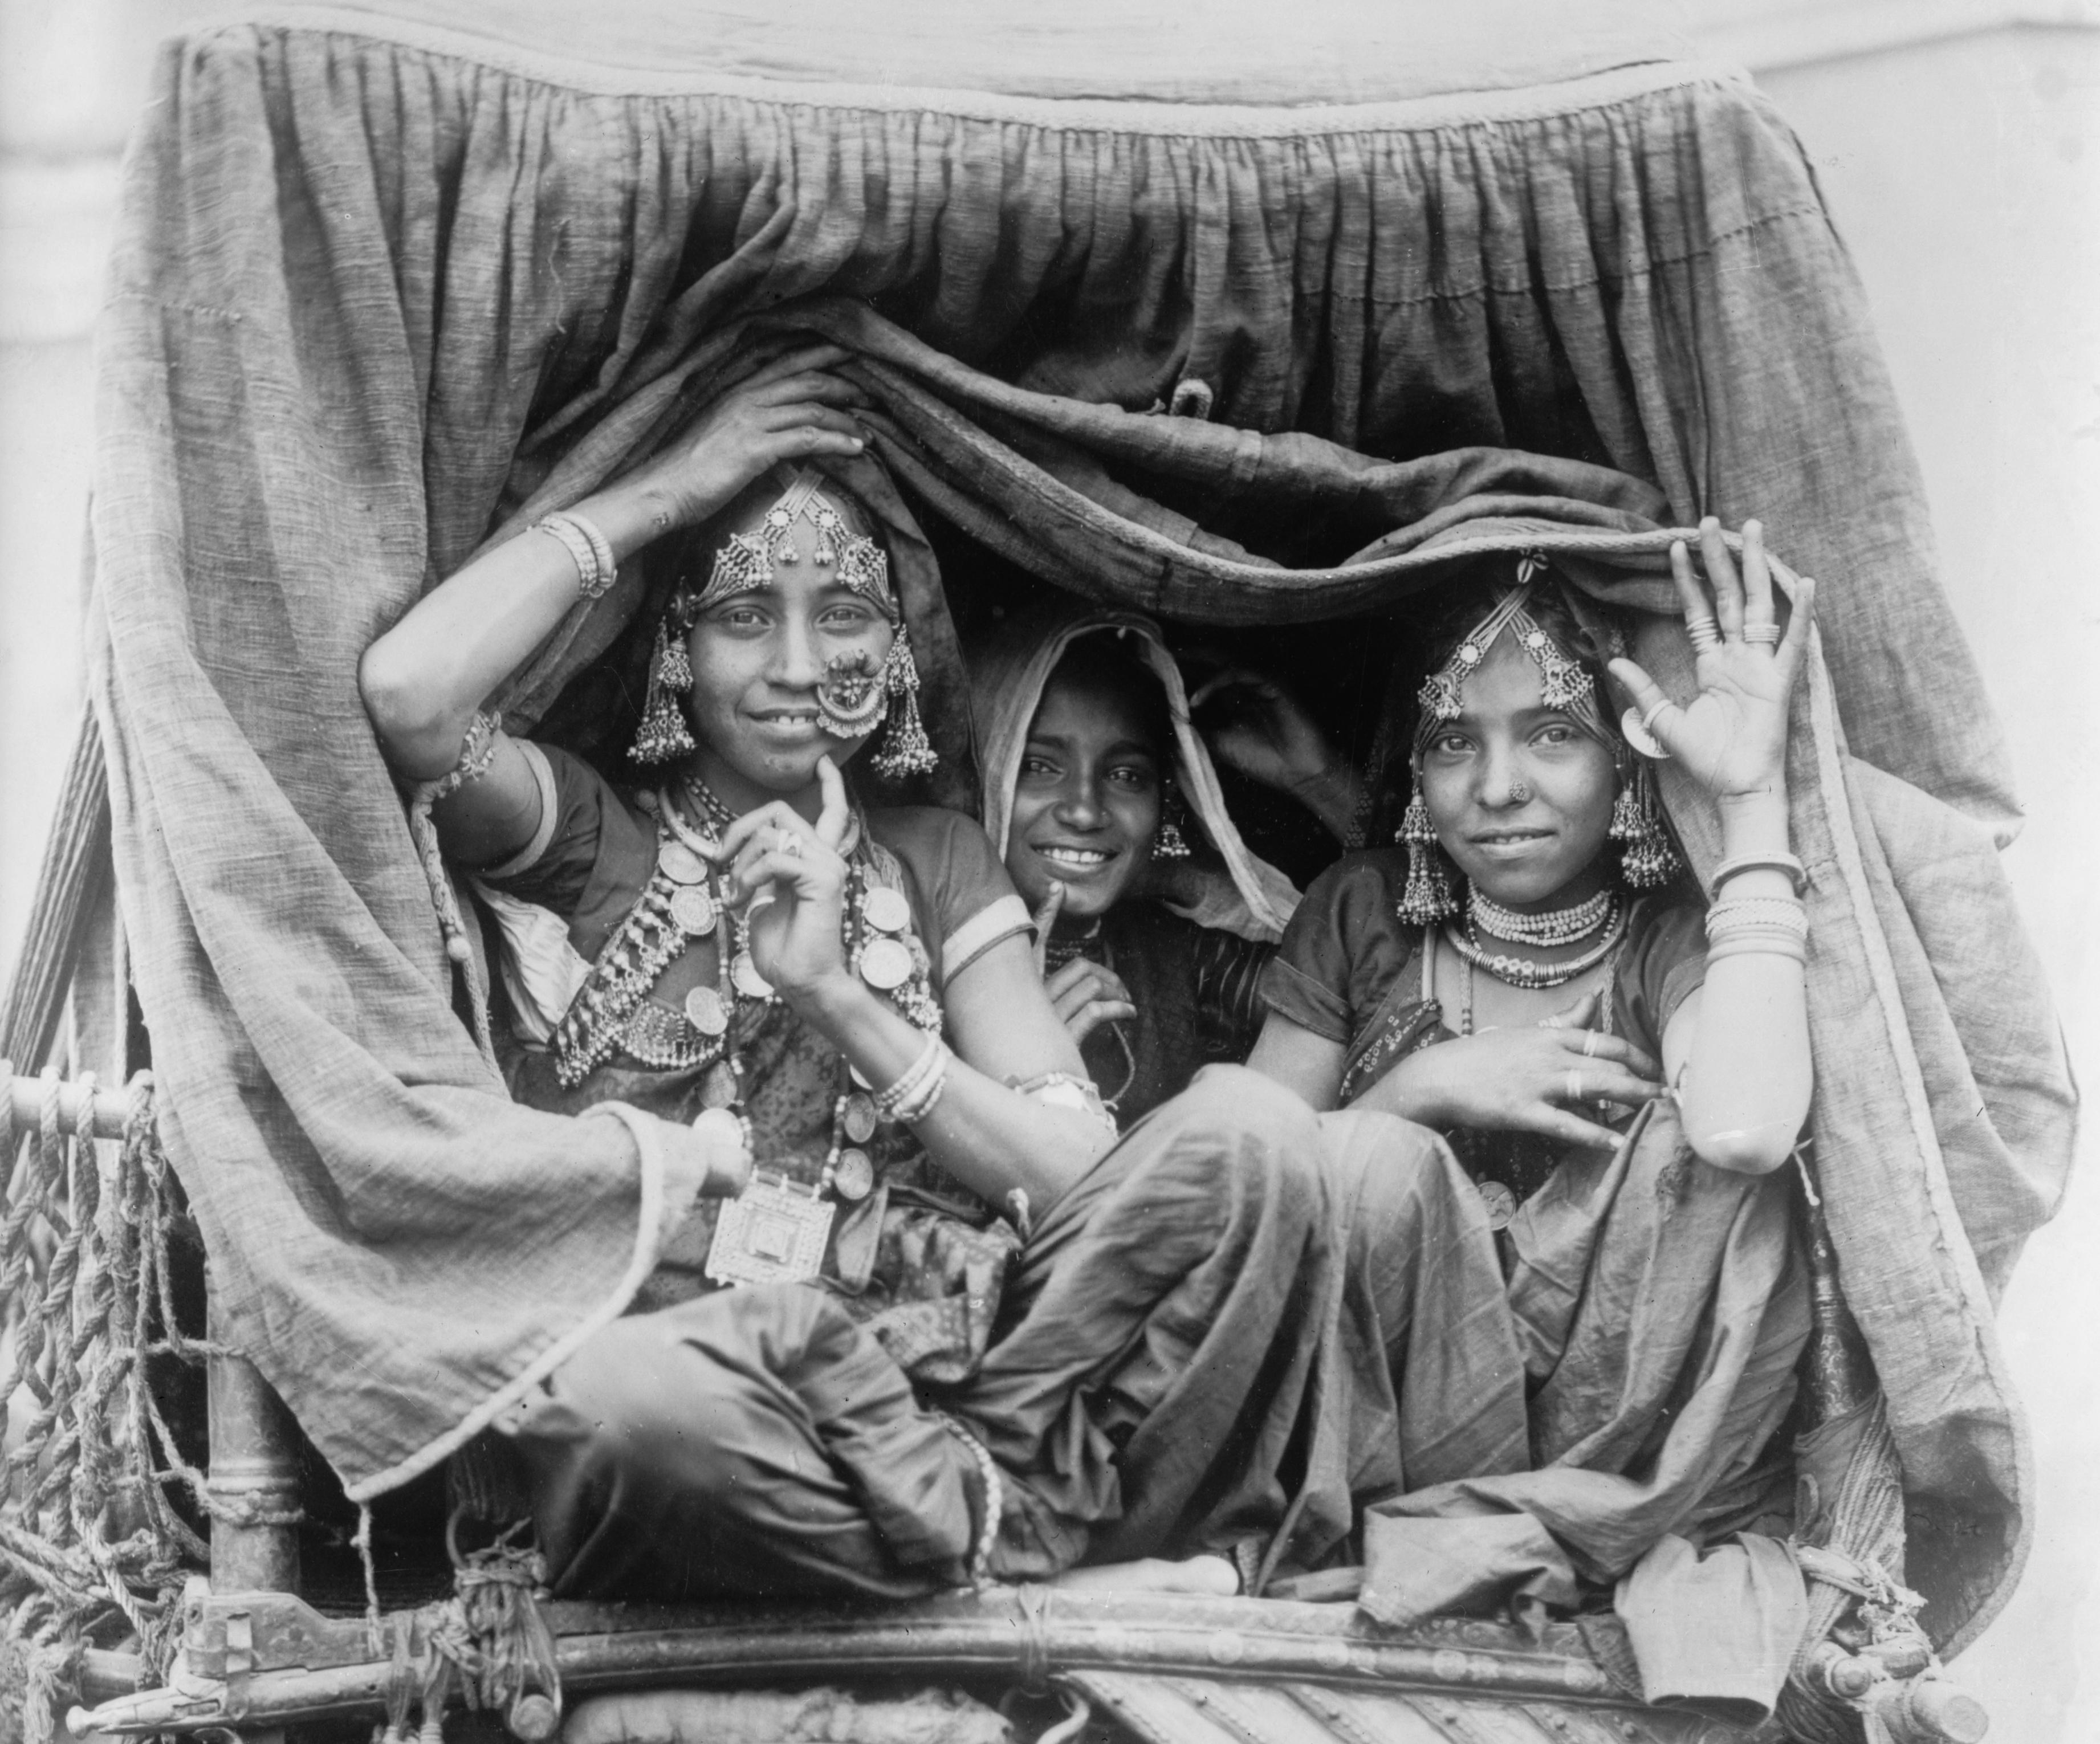 1922 photo Nautch girls India Vintage Black /& White Photograph b8